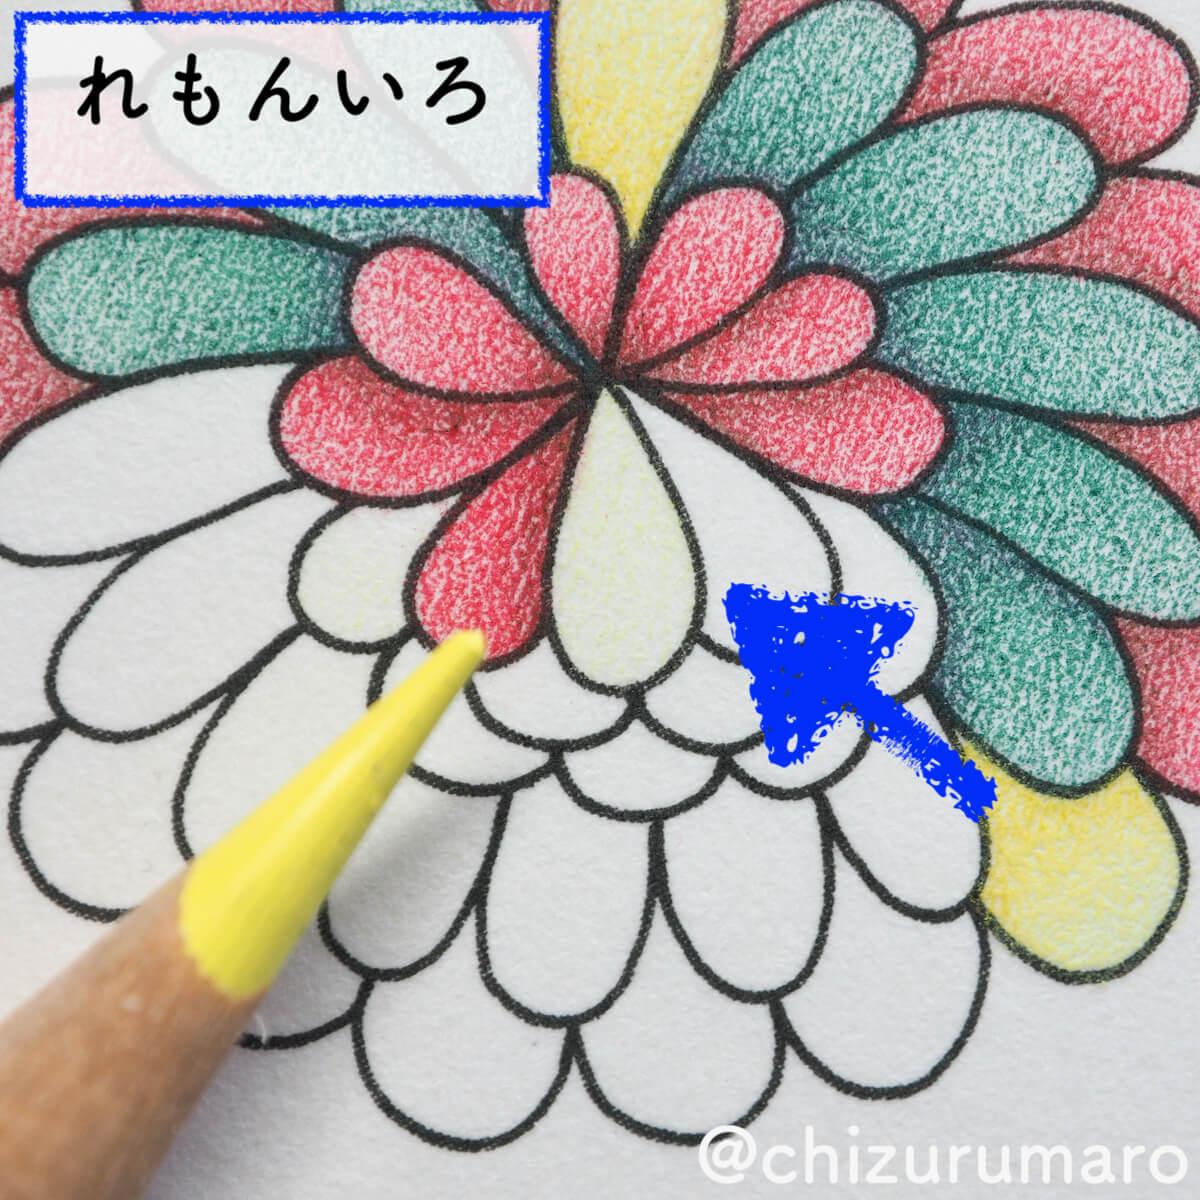 f:id:chizurumaro:20200511125044j:plain